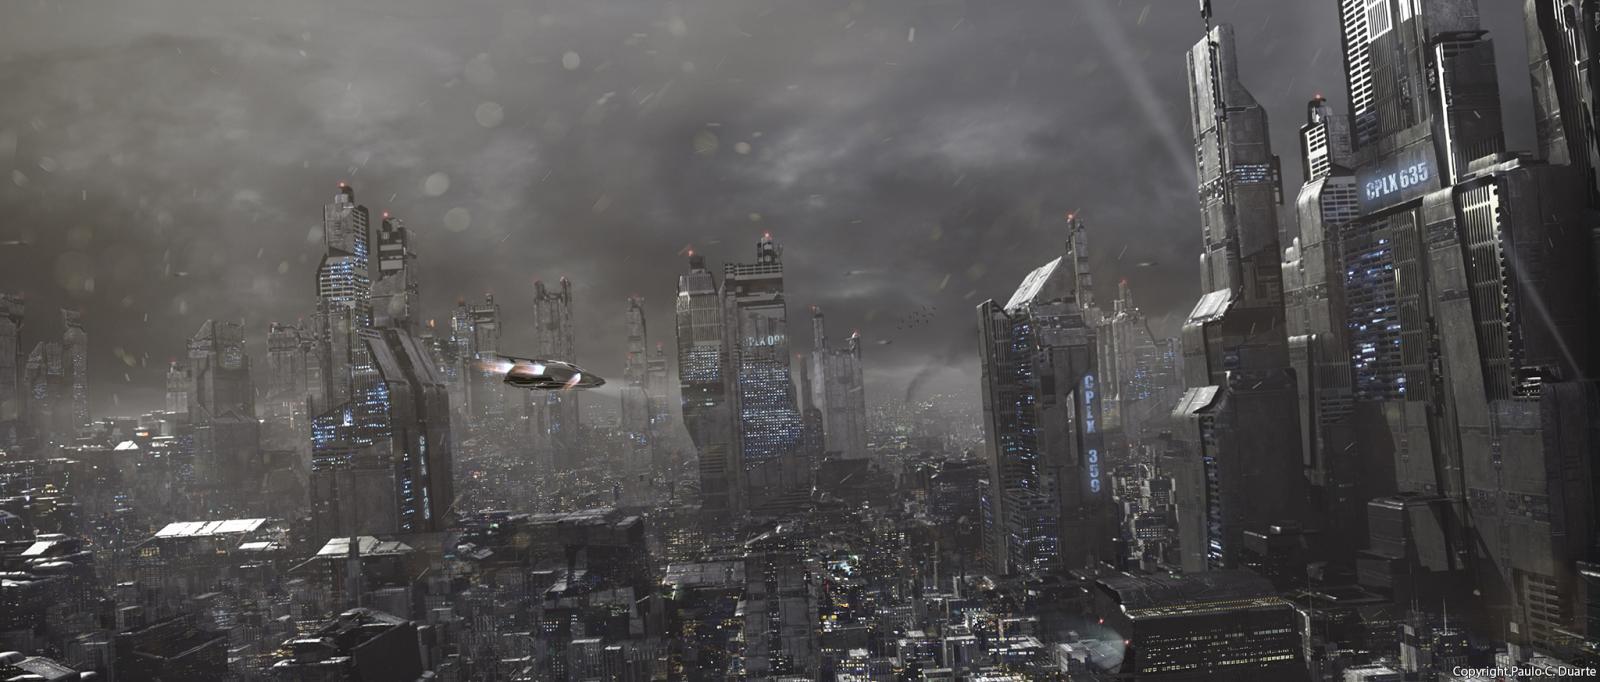 sci-fi-city-concept-001.jpg